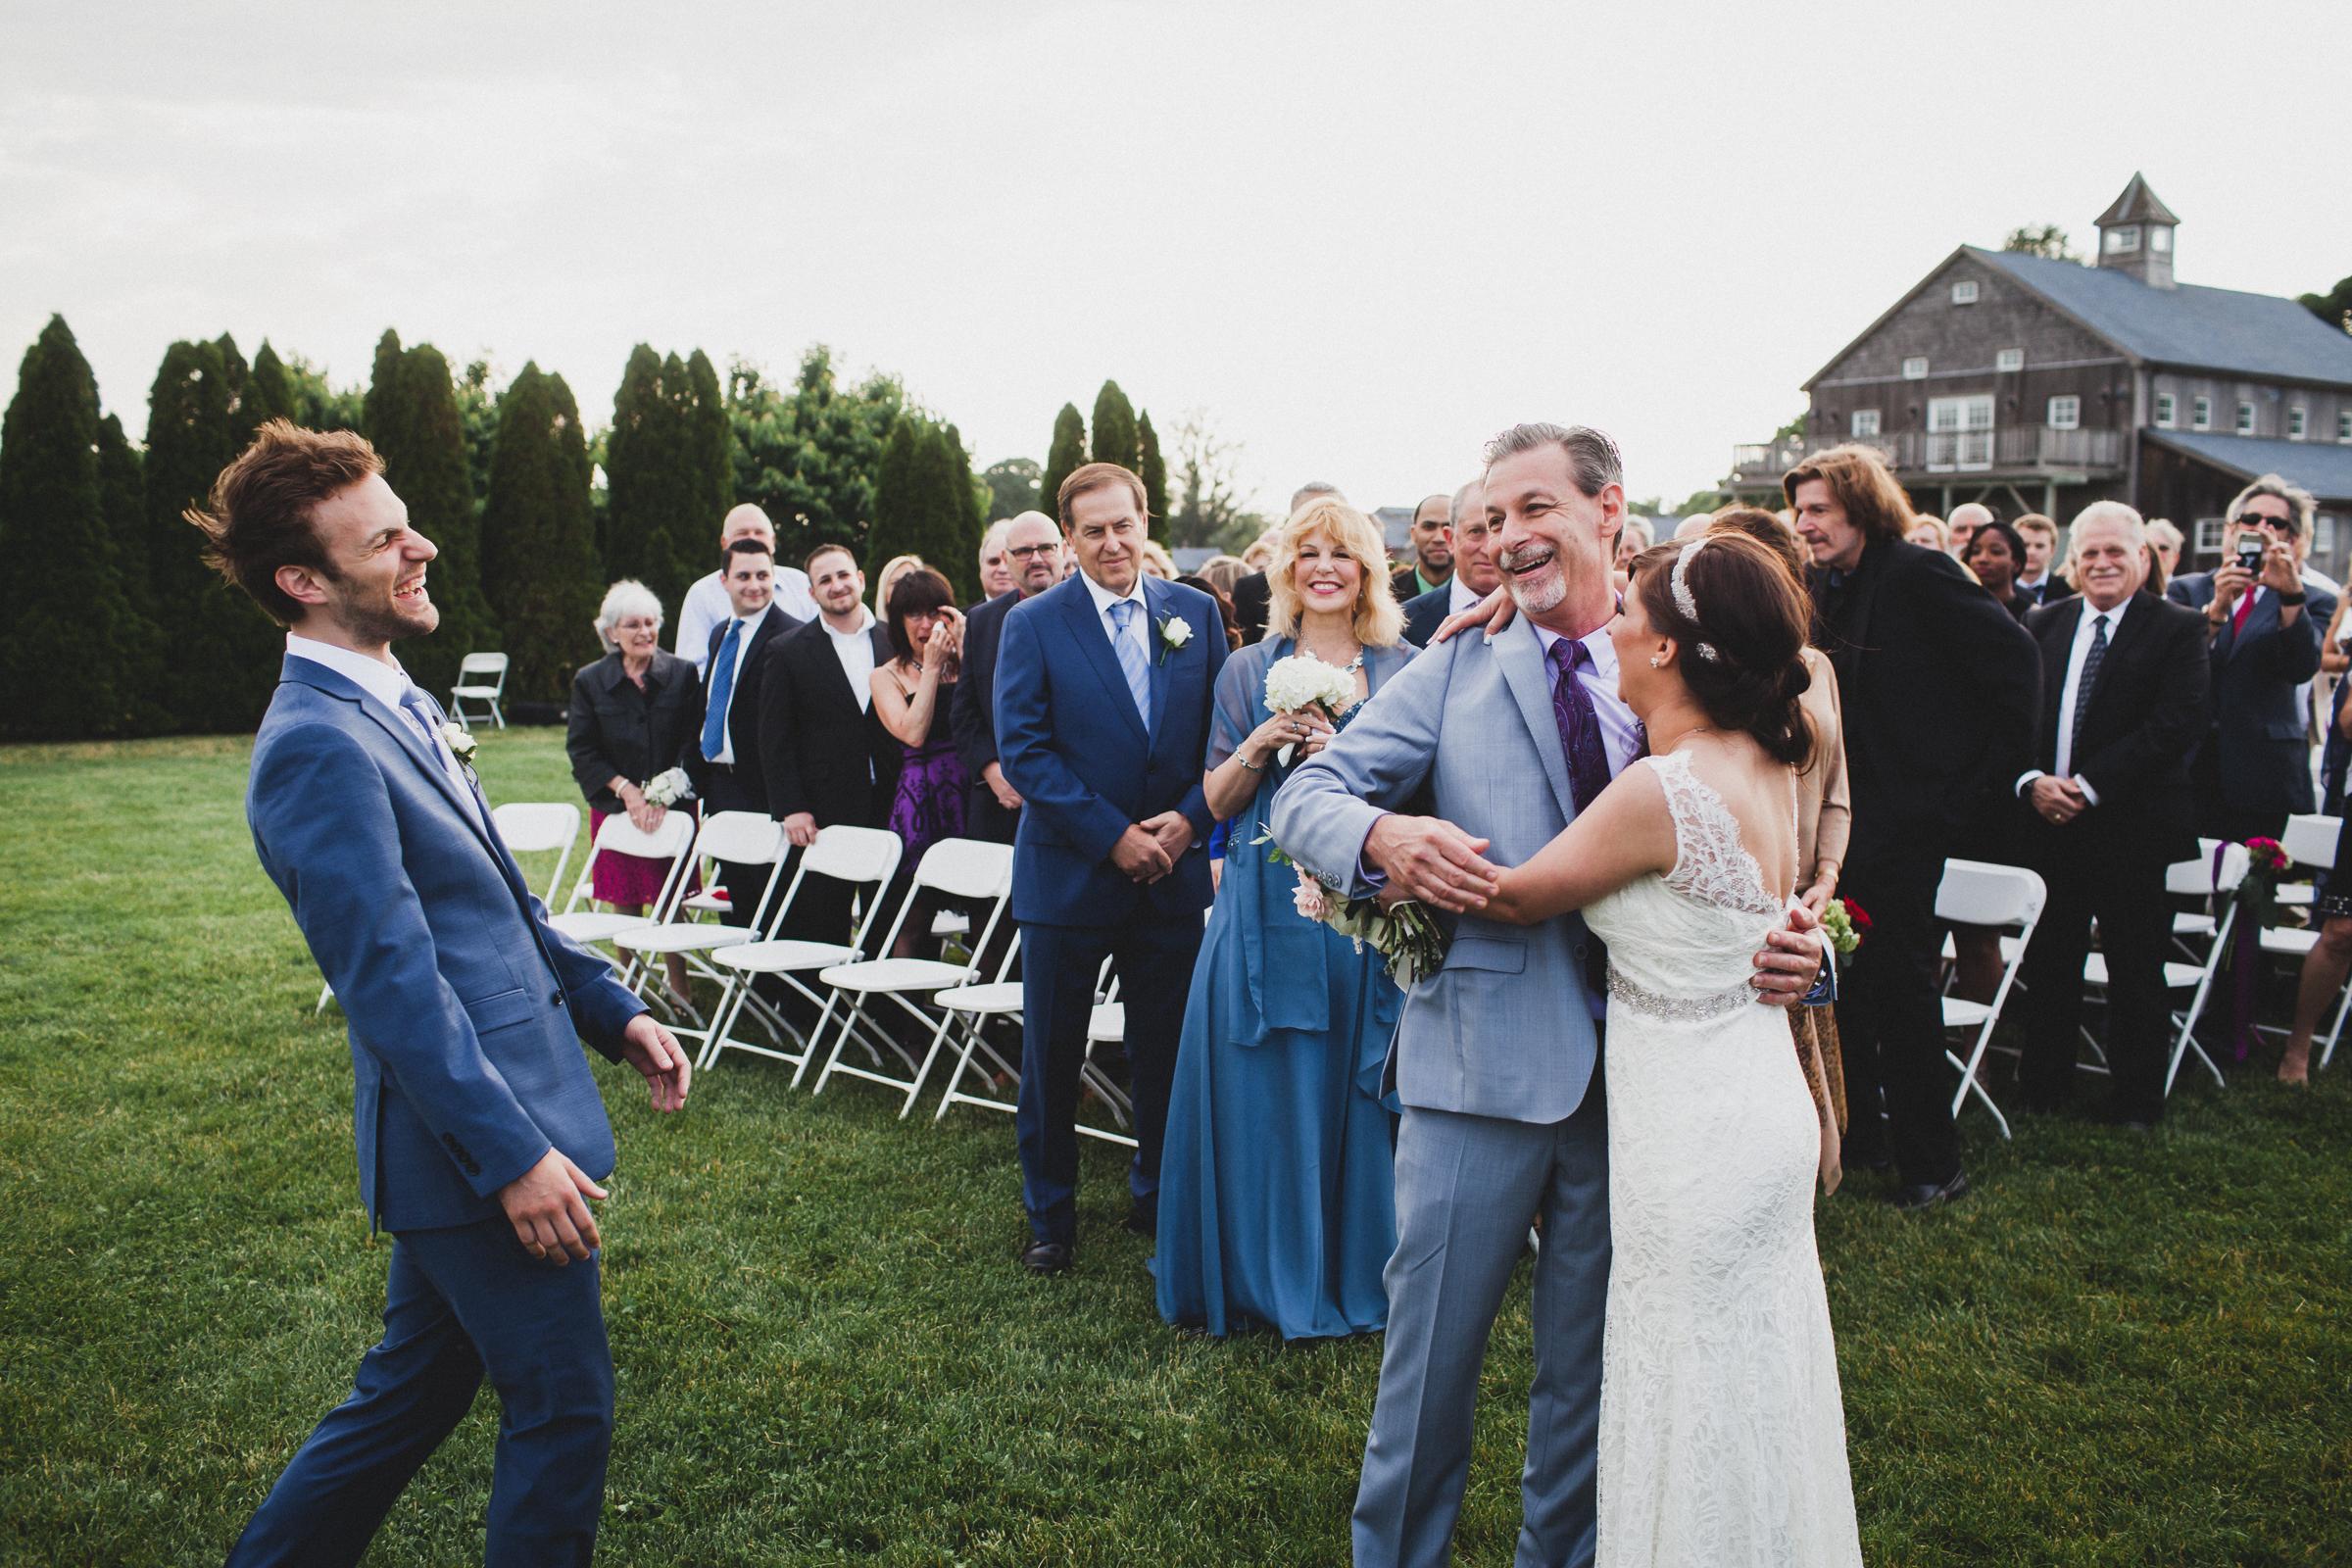 Martha-Clara-Vineyard-Long-Island-Documentary-Wedding-Photographer-50.jpg